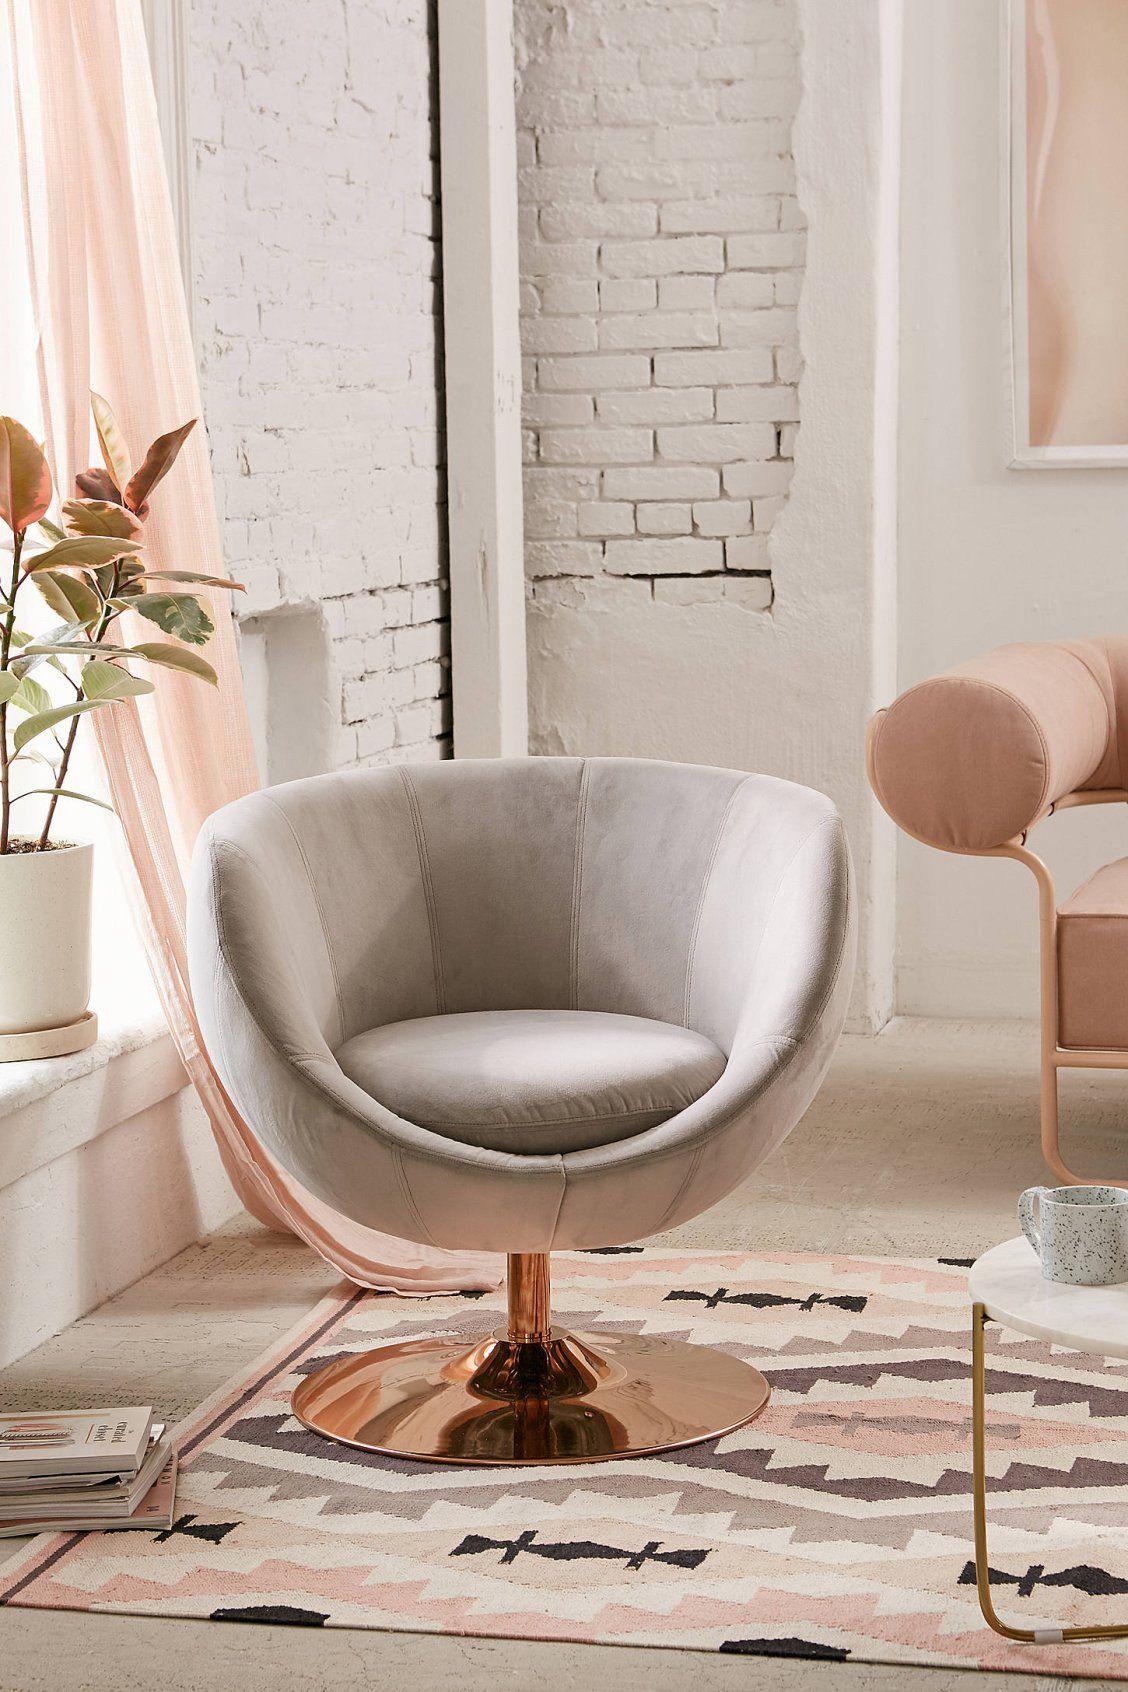 Josey Swivel Chair Furniture Luxury Office Chairs Swivel Chair #round #swivel #chairs #for #living #room